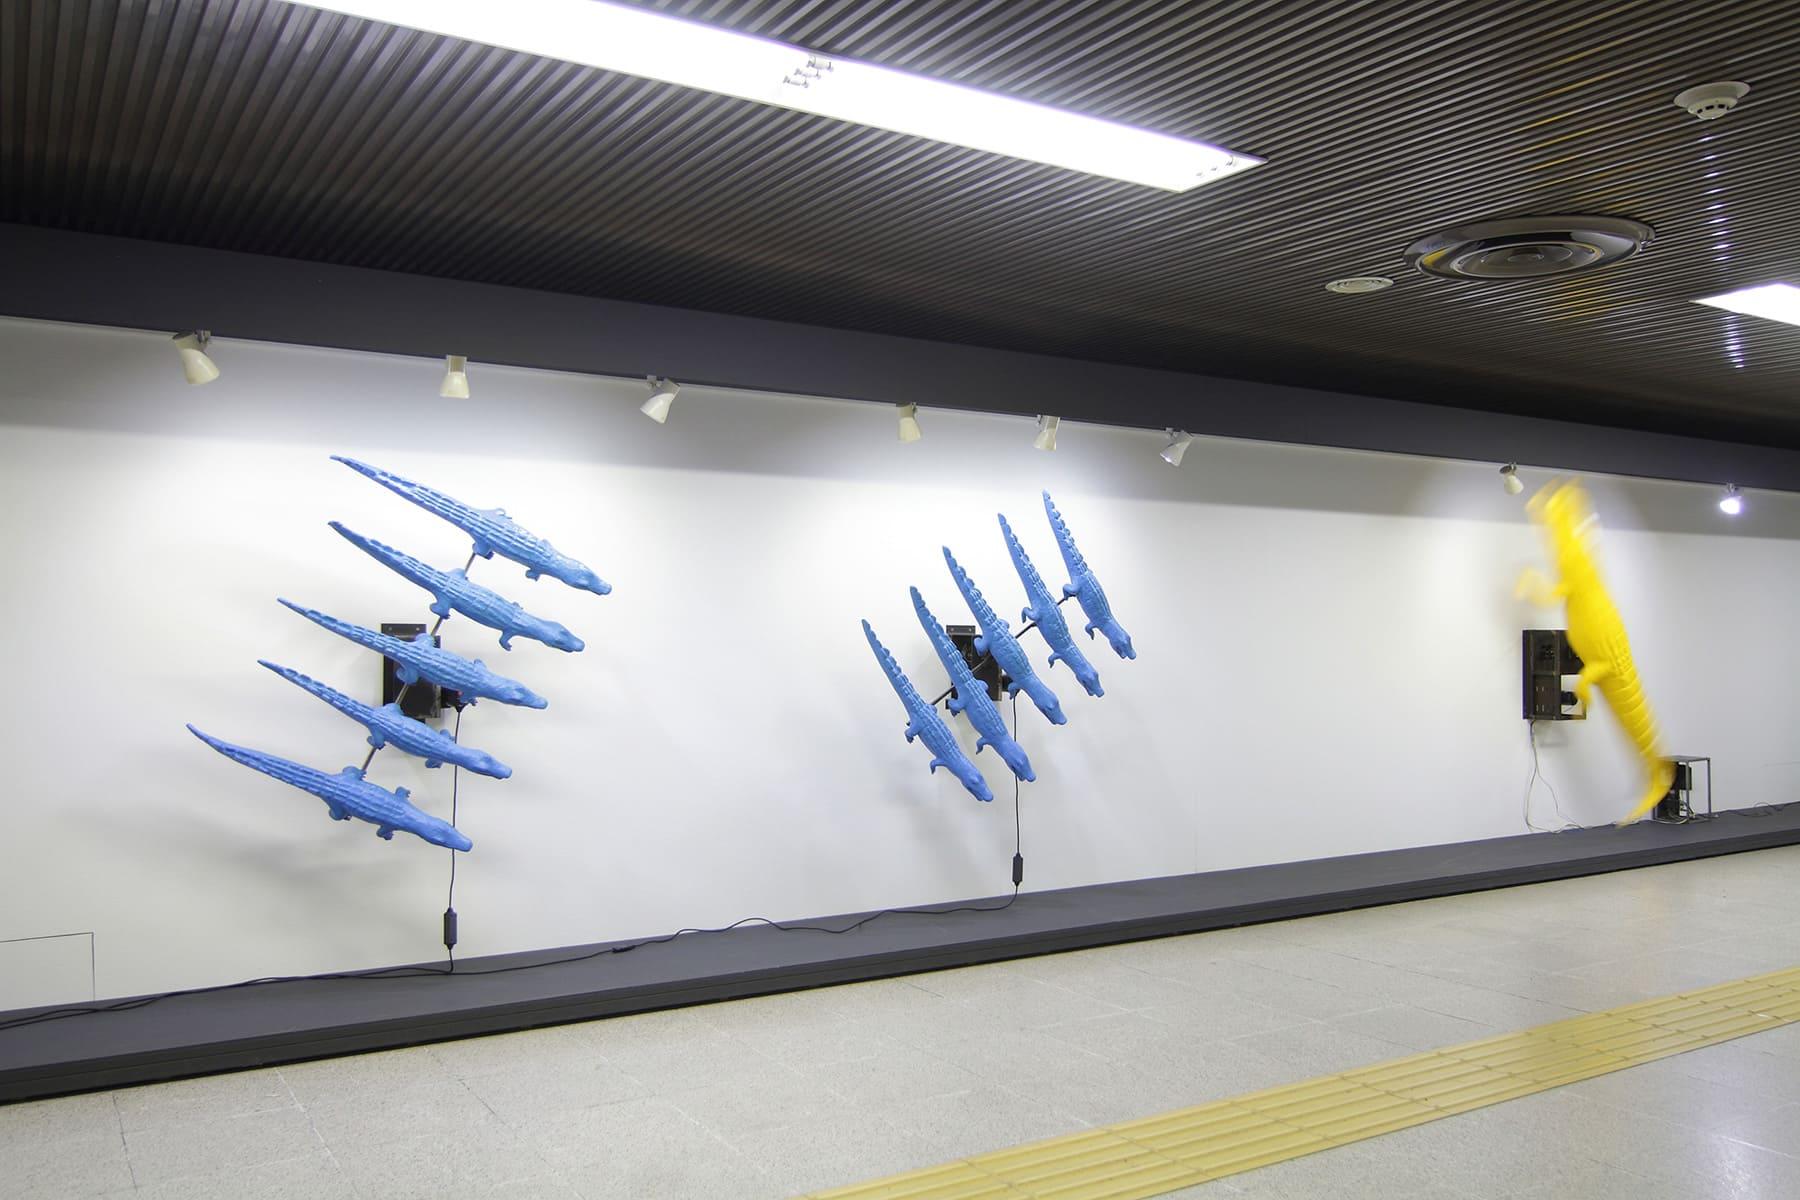 Excessive! -過剰化する表現- 500m美術館(北海道)